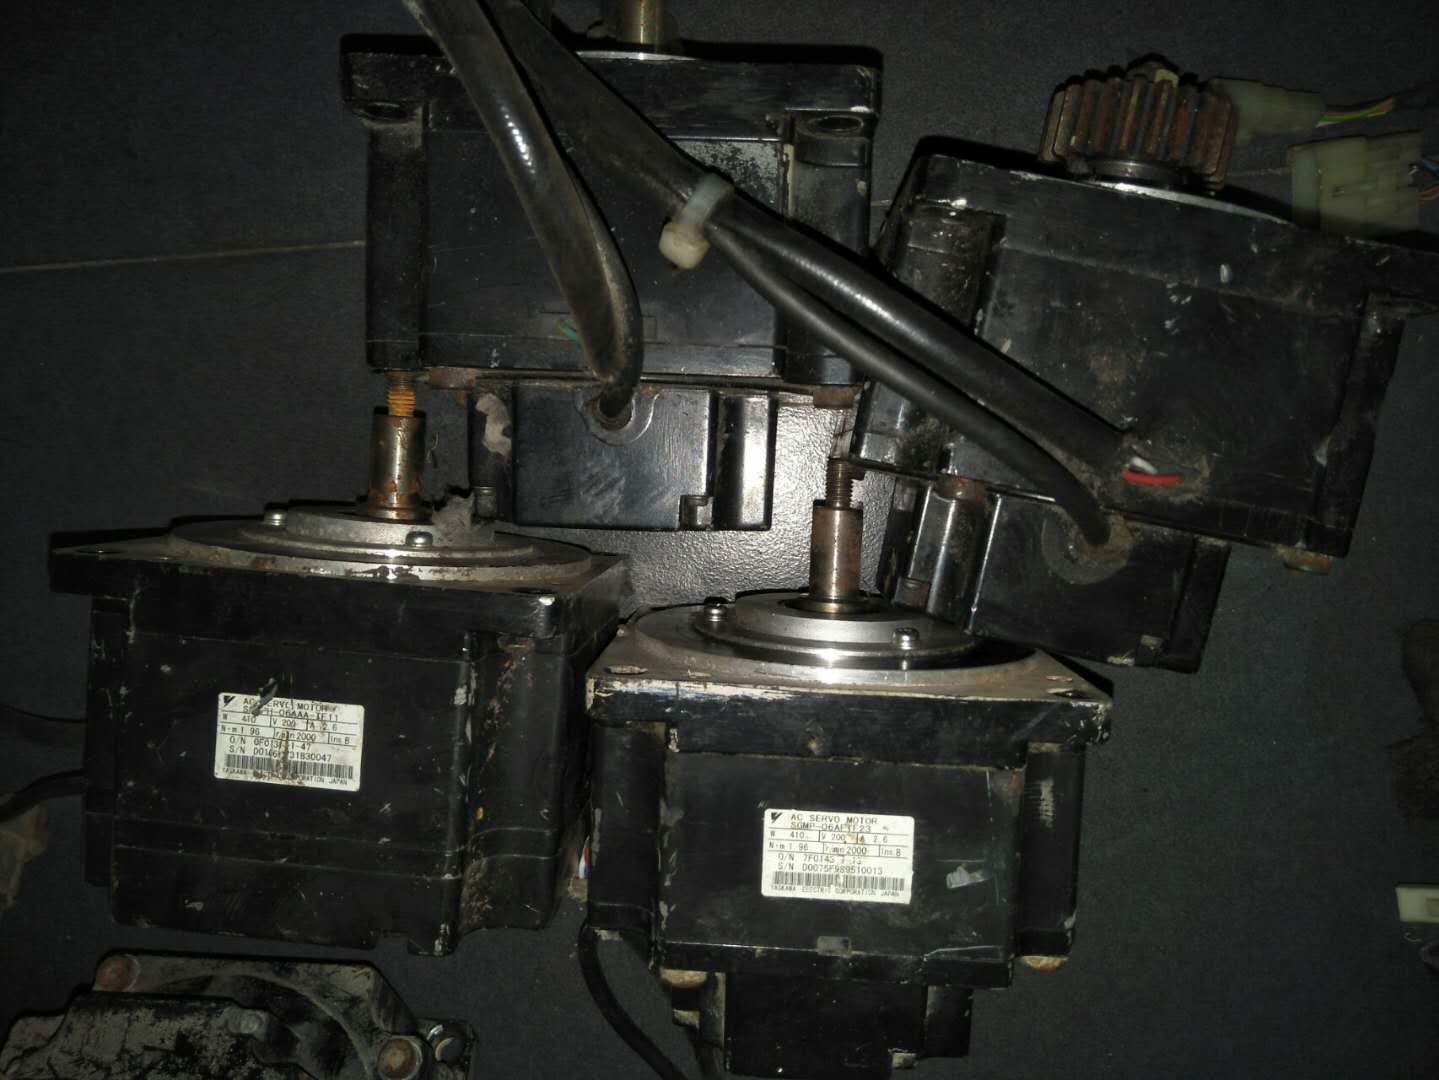 拆机安川伺服电机现货 SGMP-06AFTF23 议价